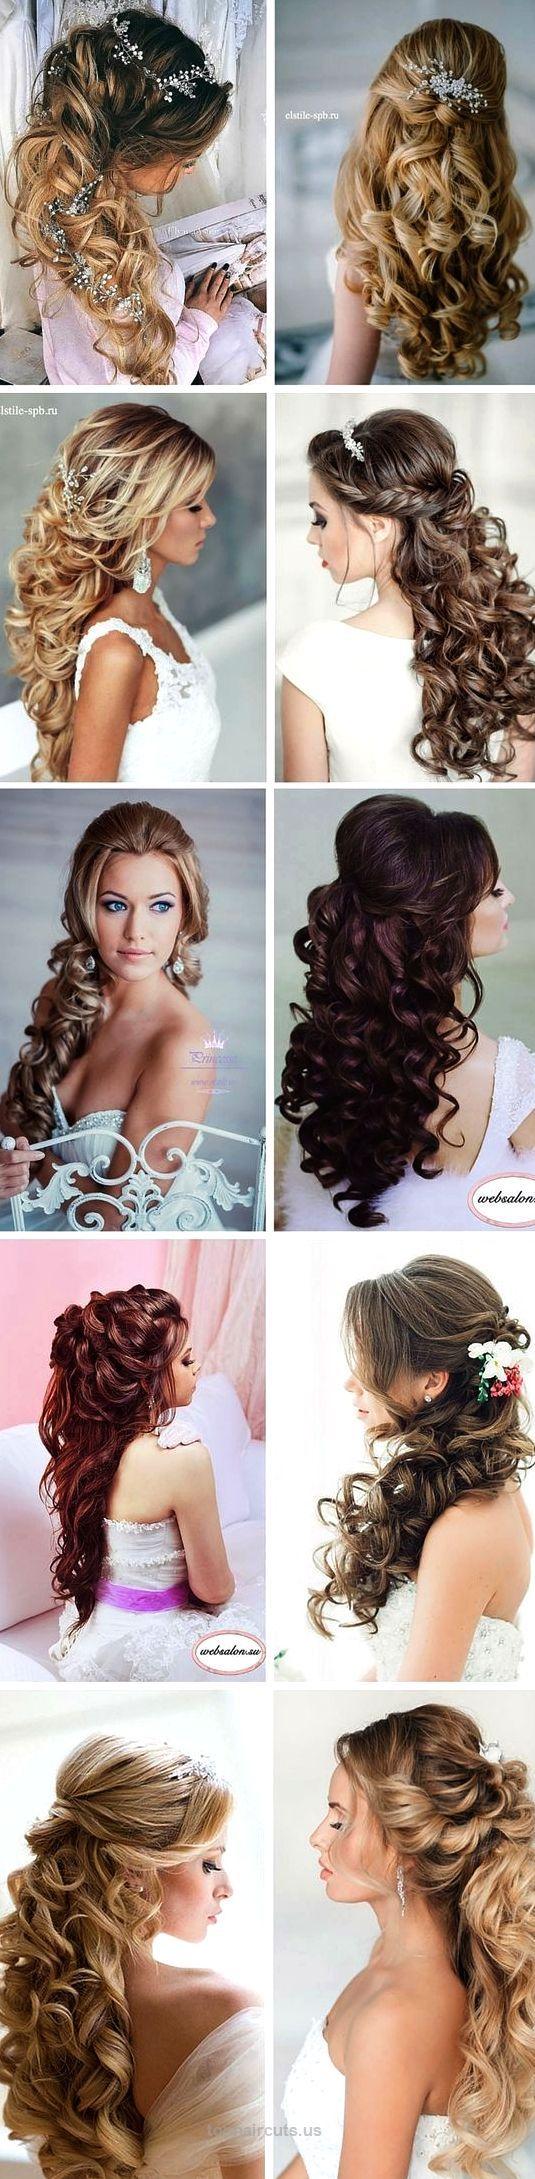 Long Hairstyles Wedding Blonde Long Hairstyles Layer Long Hairstyles Long Brunette H Wedding Hairstyles For Long Hair Long Hair Styles Wedding Hair Down